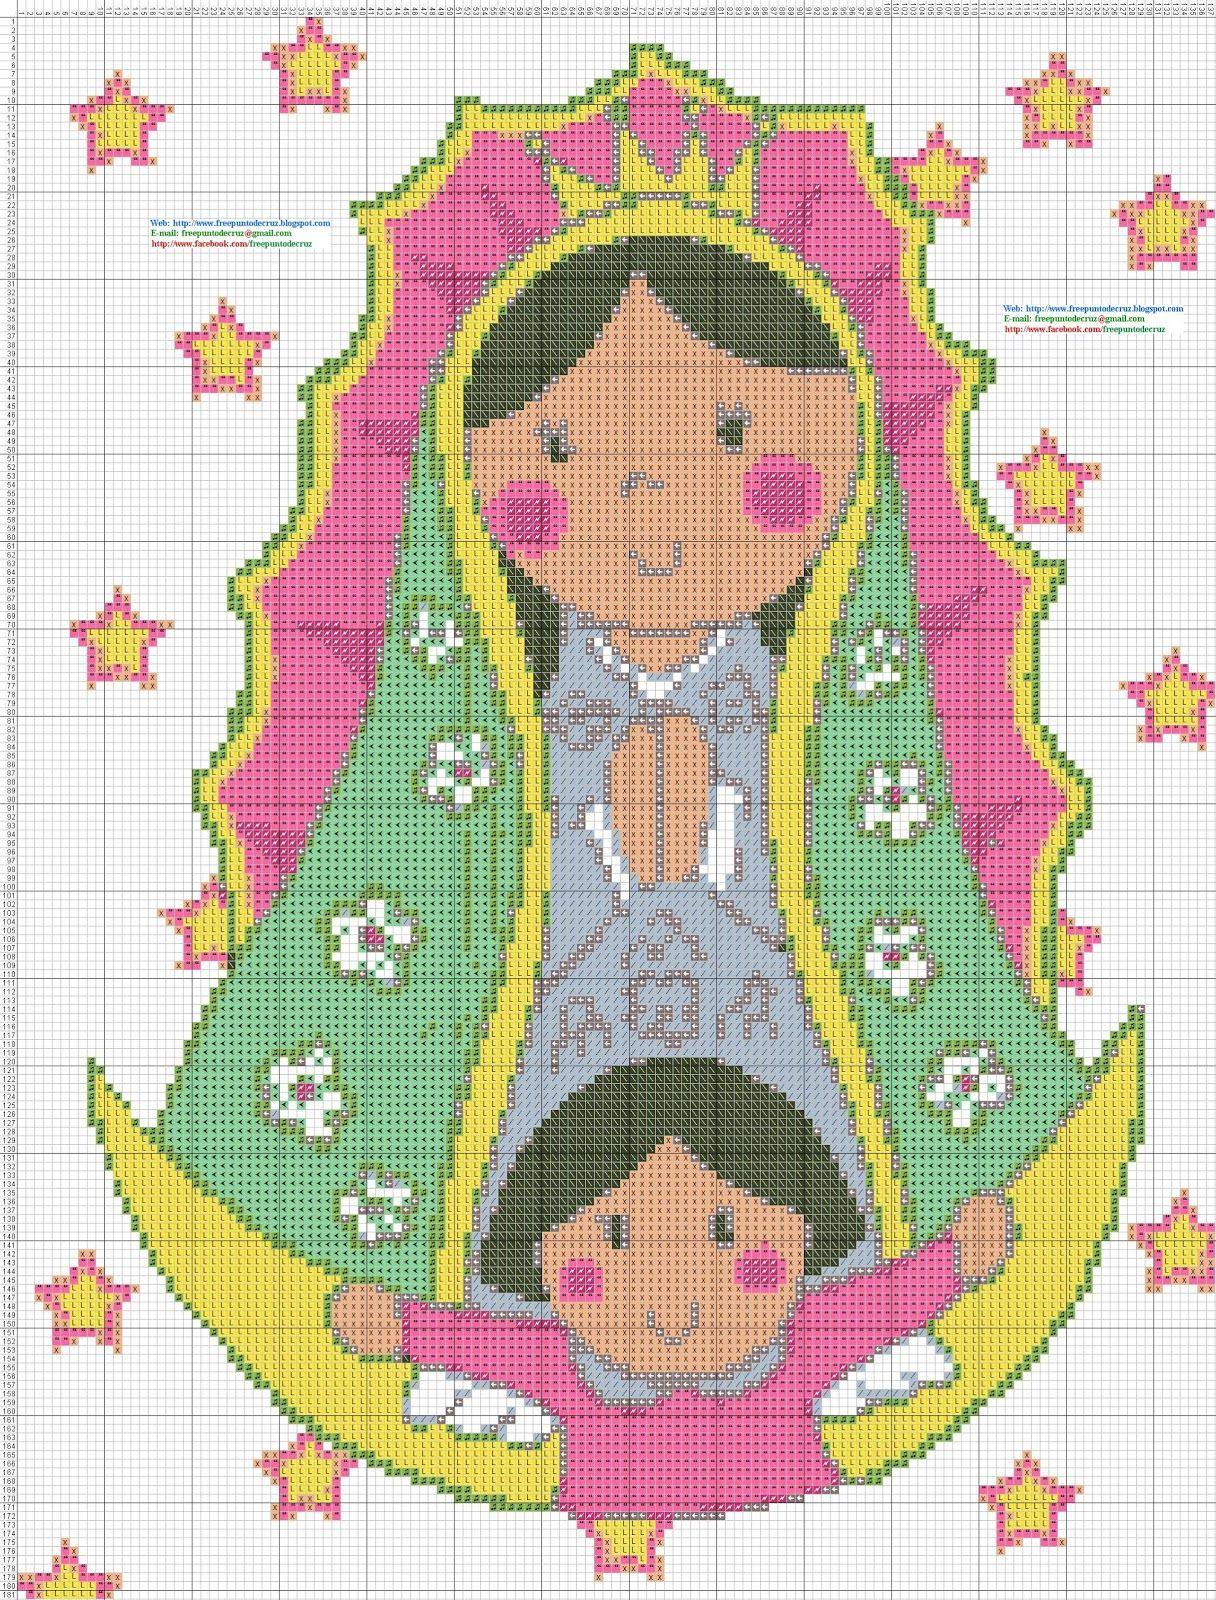 Dibujos Punto de Cruz Gratis: Virgen de Guadalupe Animada - Punto ...